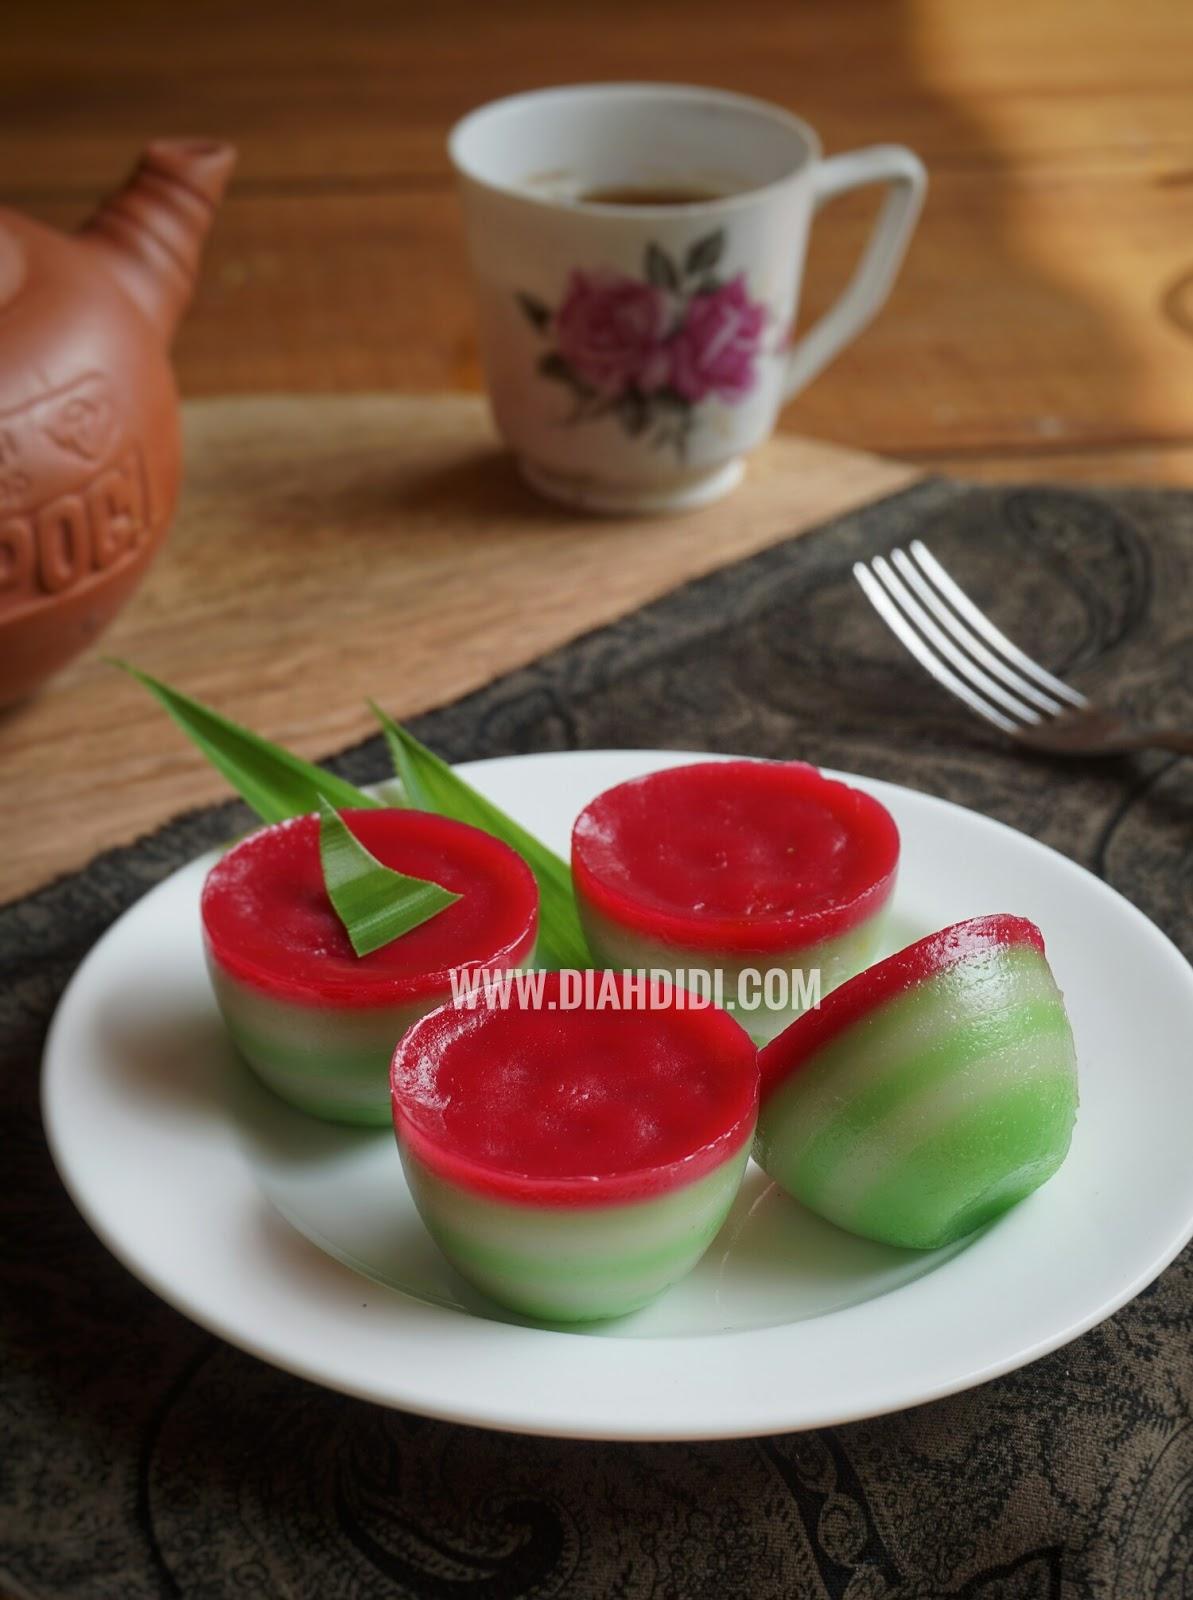 Diah Didis Kitchen Kue Lapis Mini